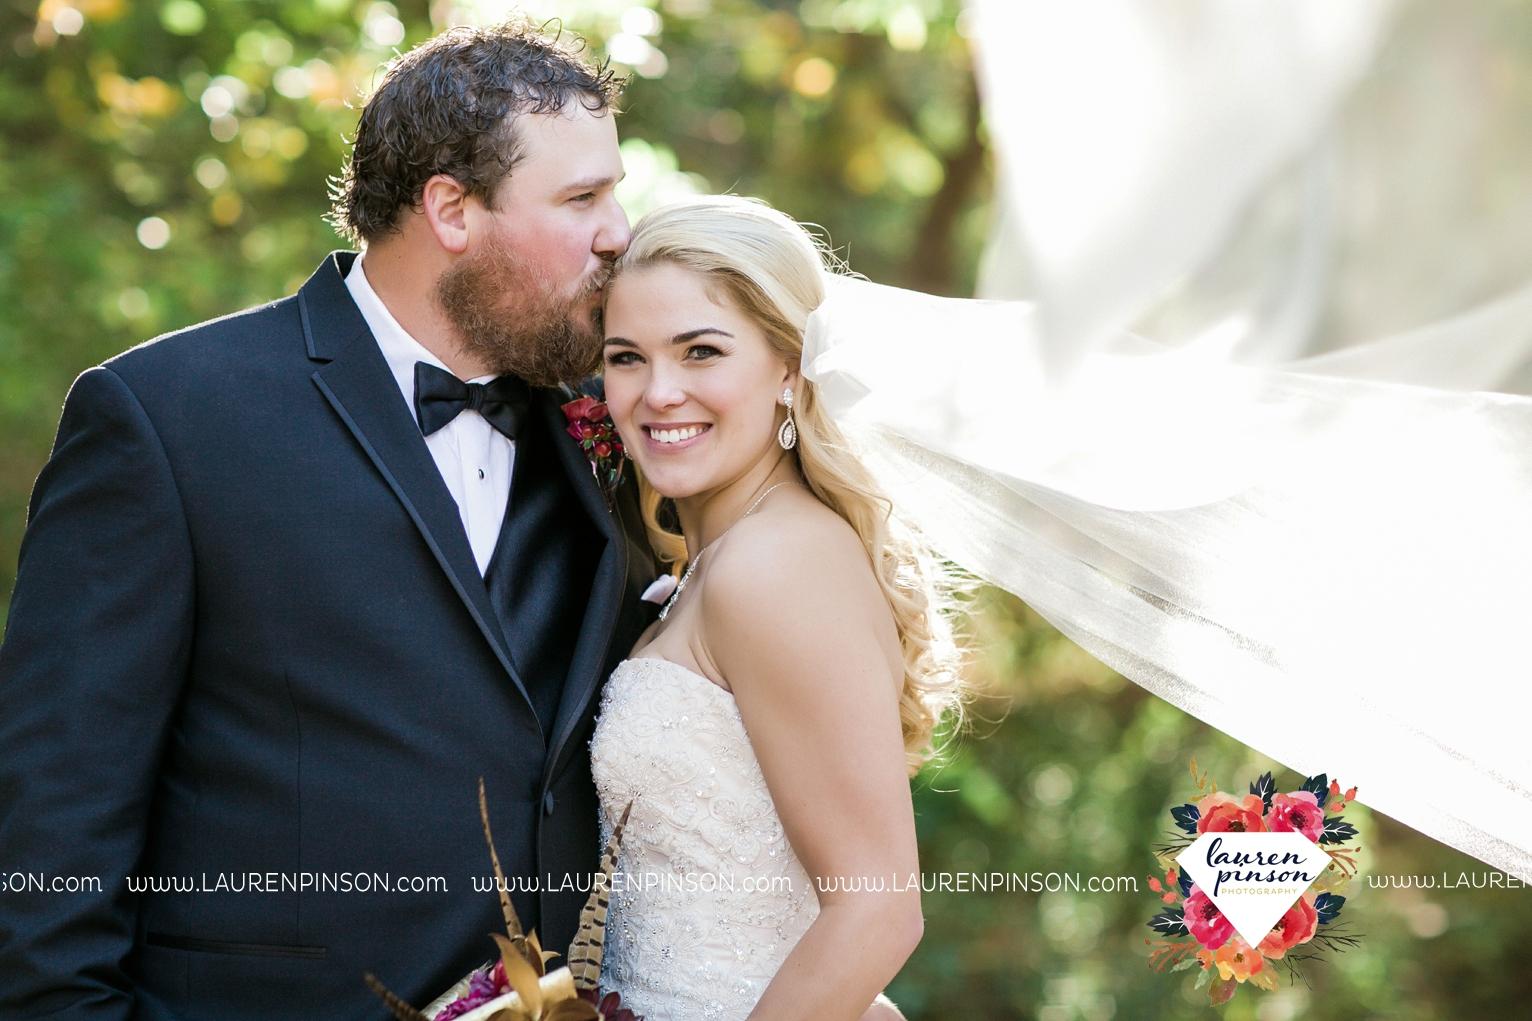 rustic-wichita-falls-texas-wedding-photographer-gold-glam-mayfield-events-market-street-united-allue-bridals-fall_1741.jpg